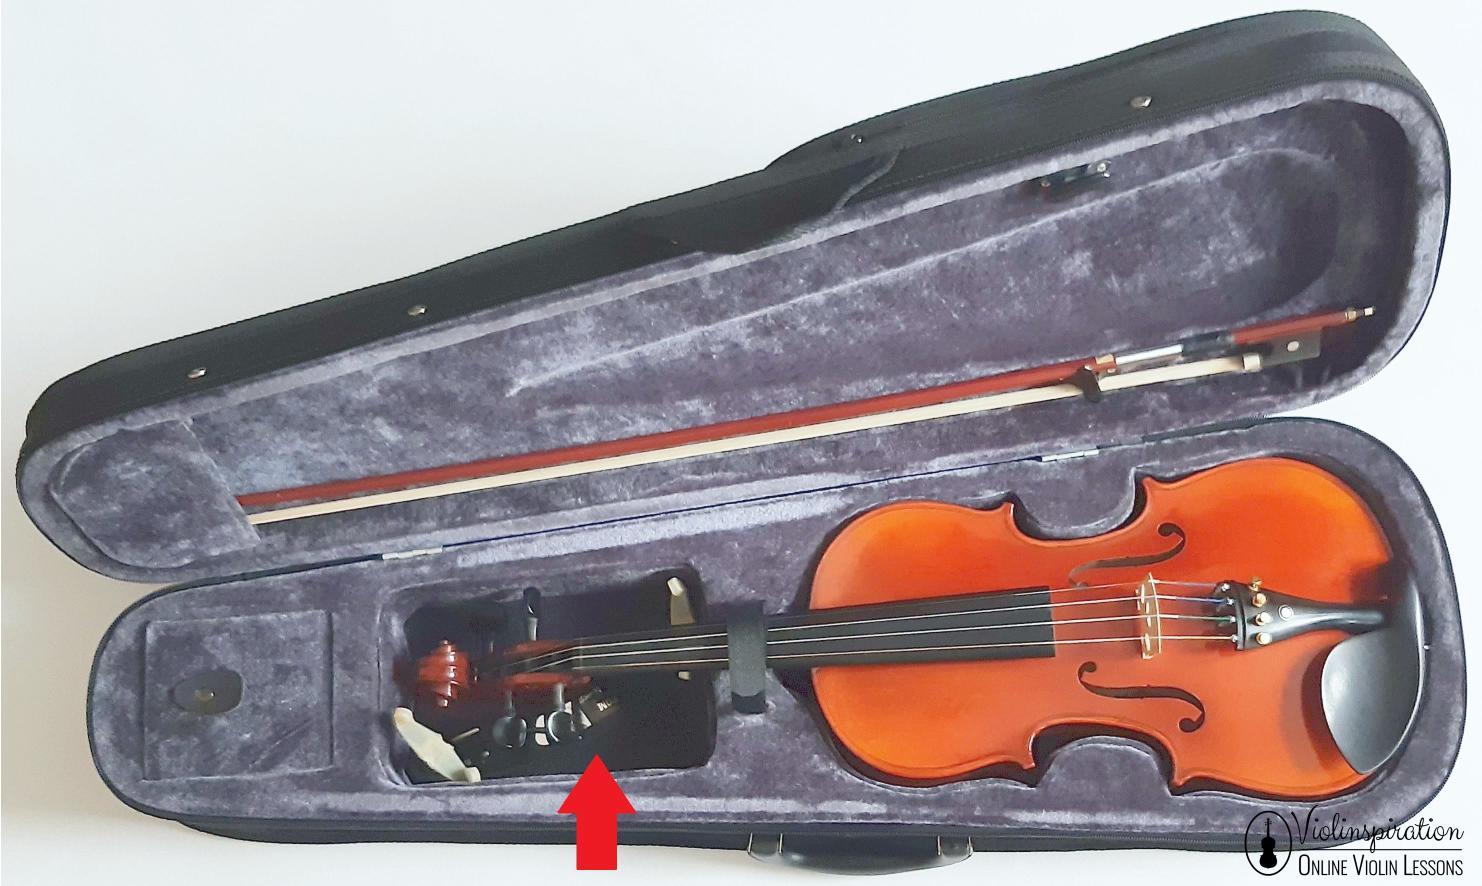 Where to put a shoulder rest in a case - shoulder rest fits under the neck of the violin